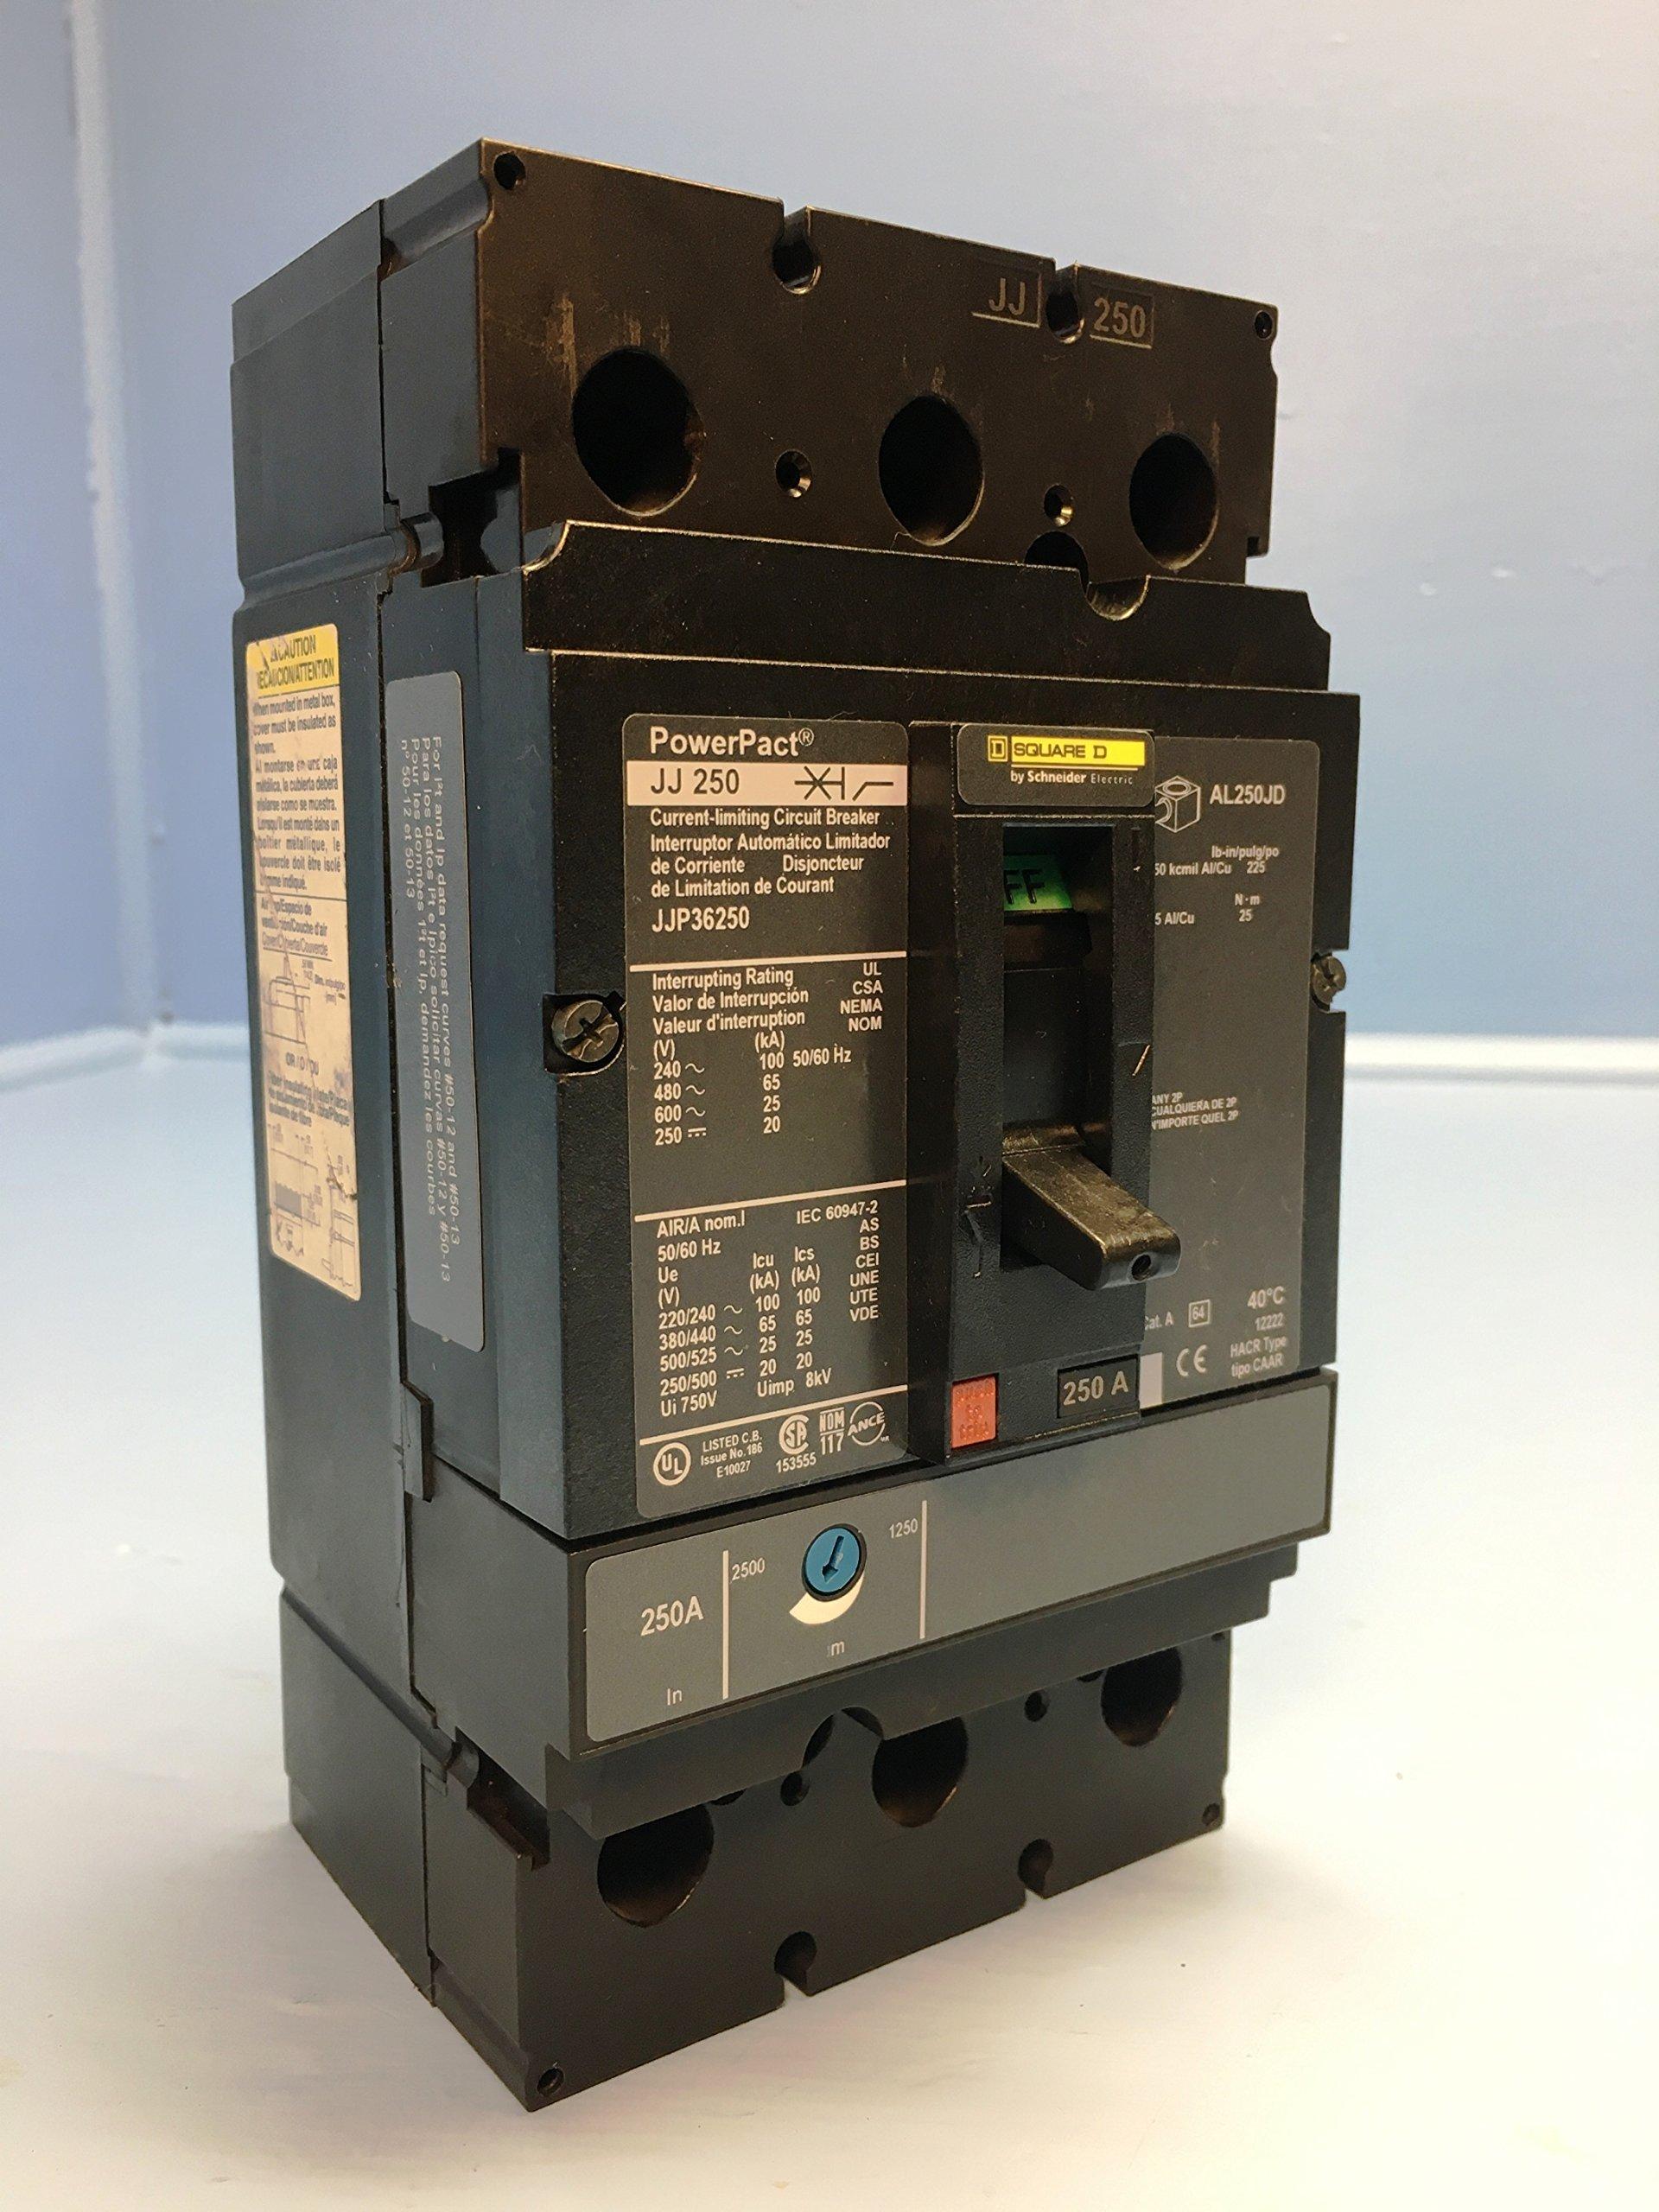 Square D JJP36250 JJ 250 Amp PowerPact Circuit Breaker 3P 600V JJ250 250A HACR